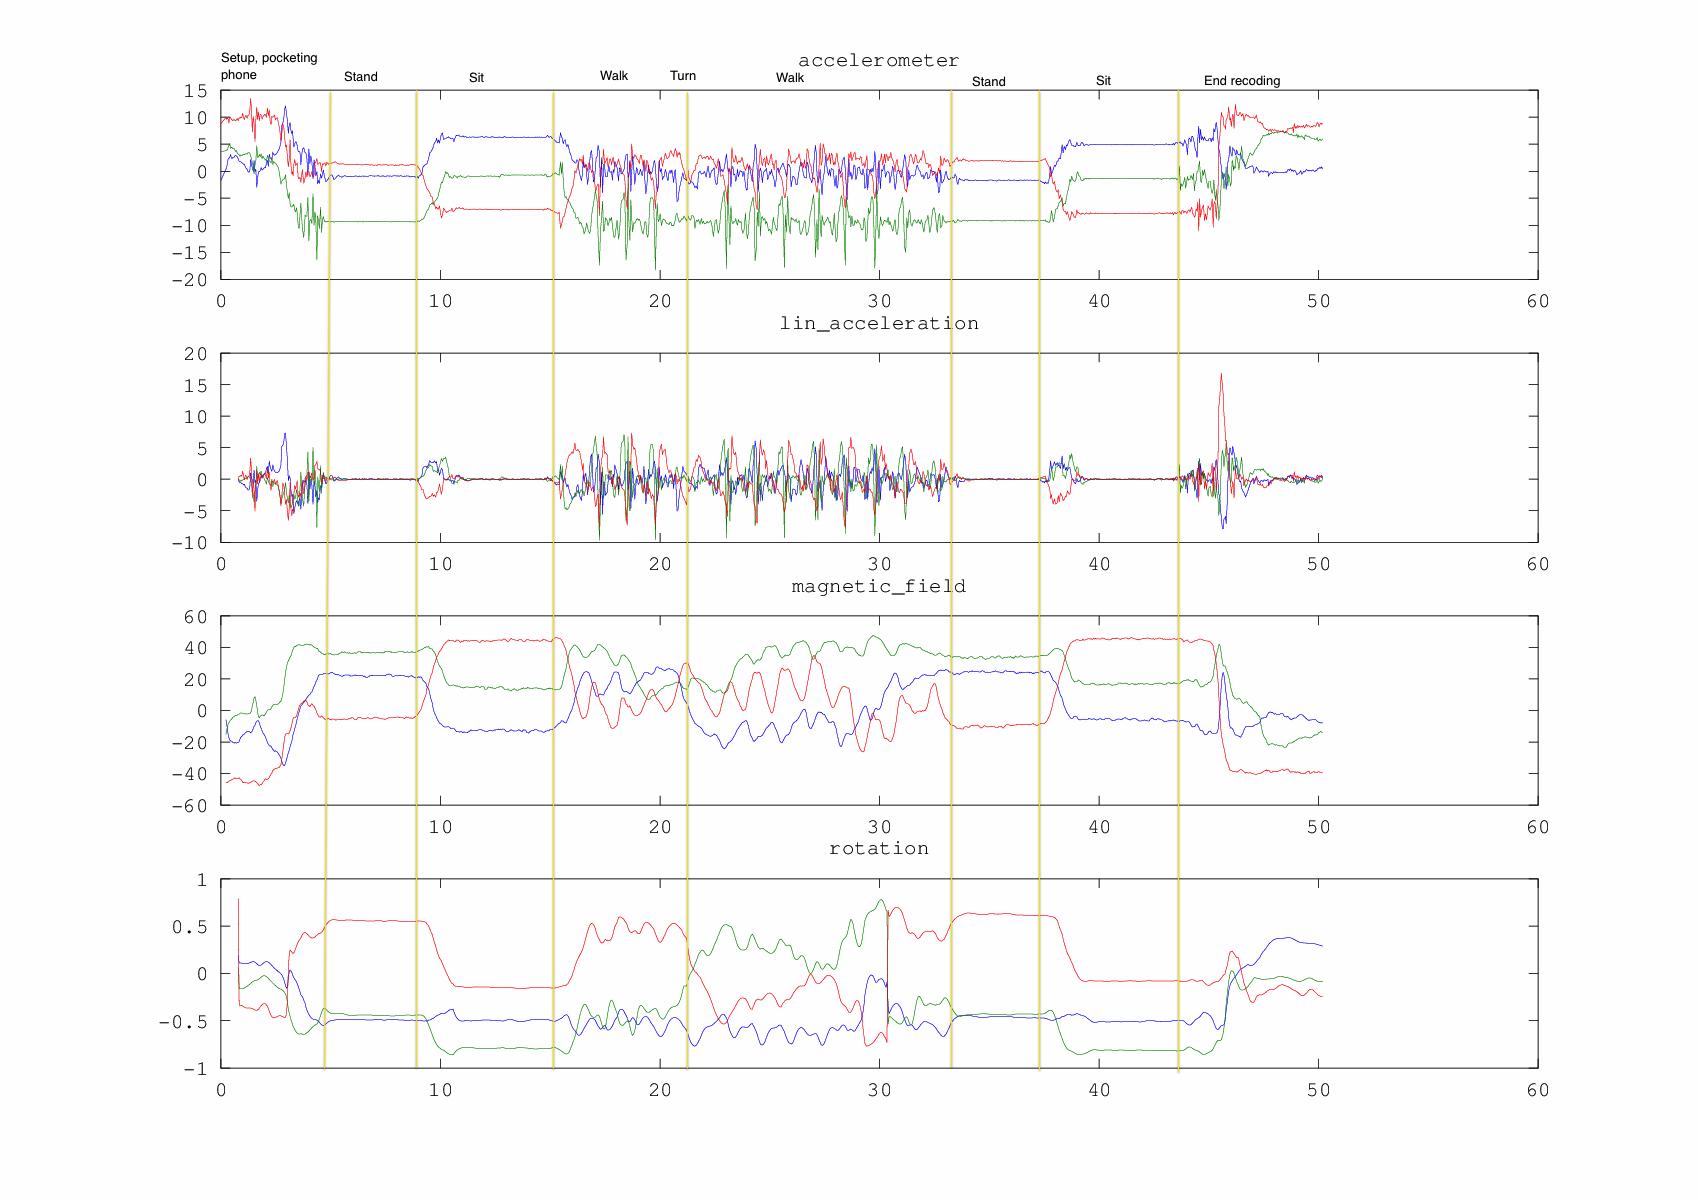 Accelerometer data